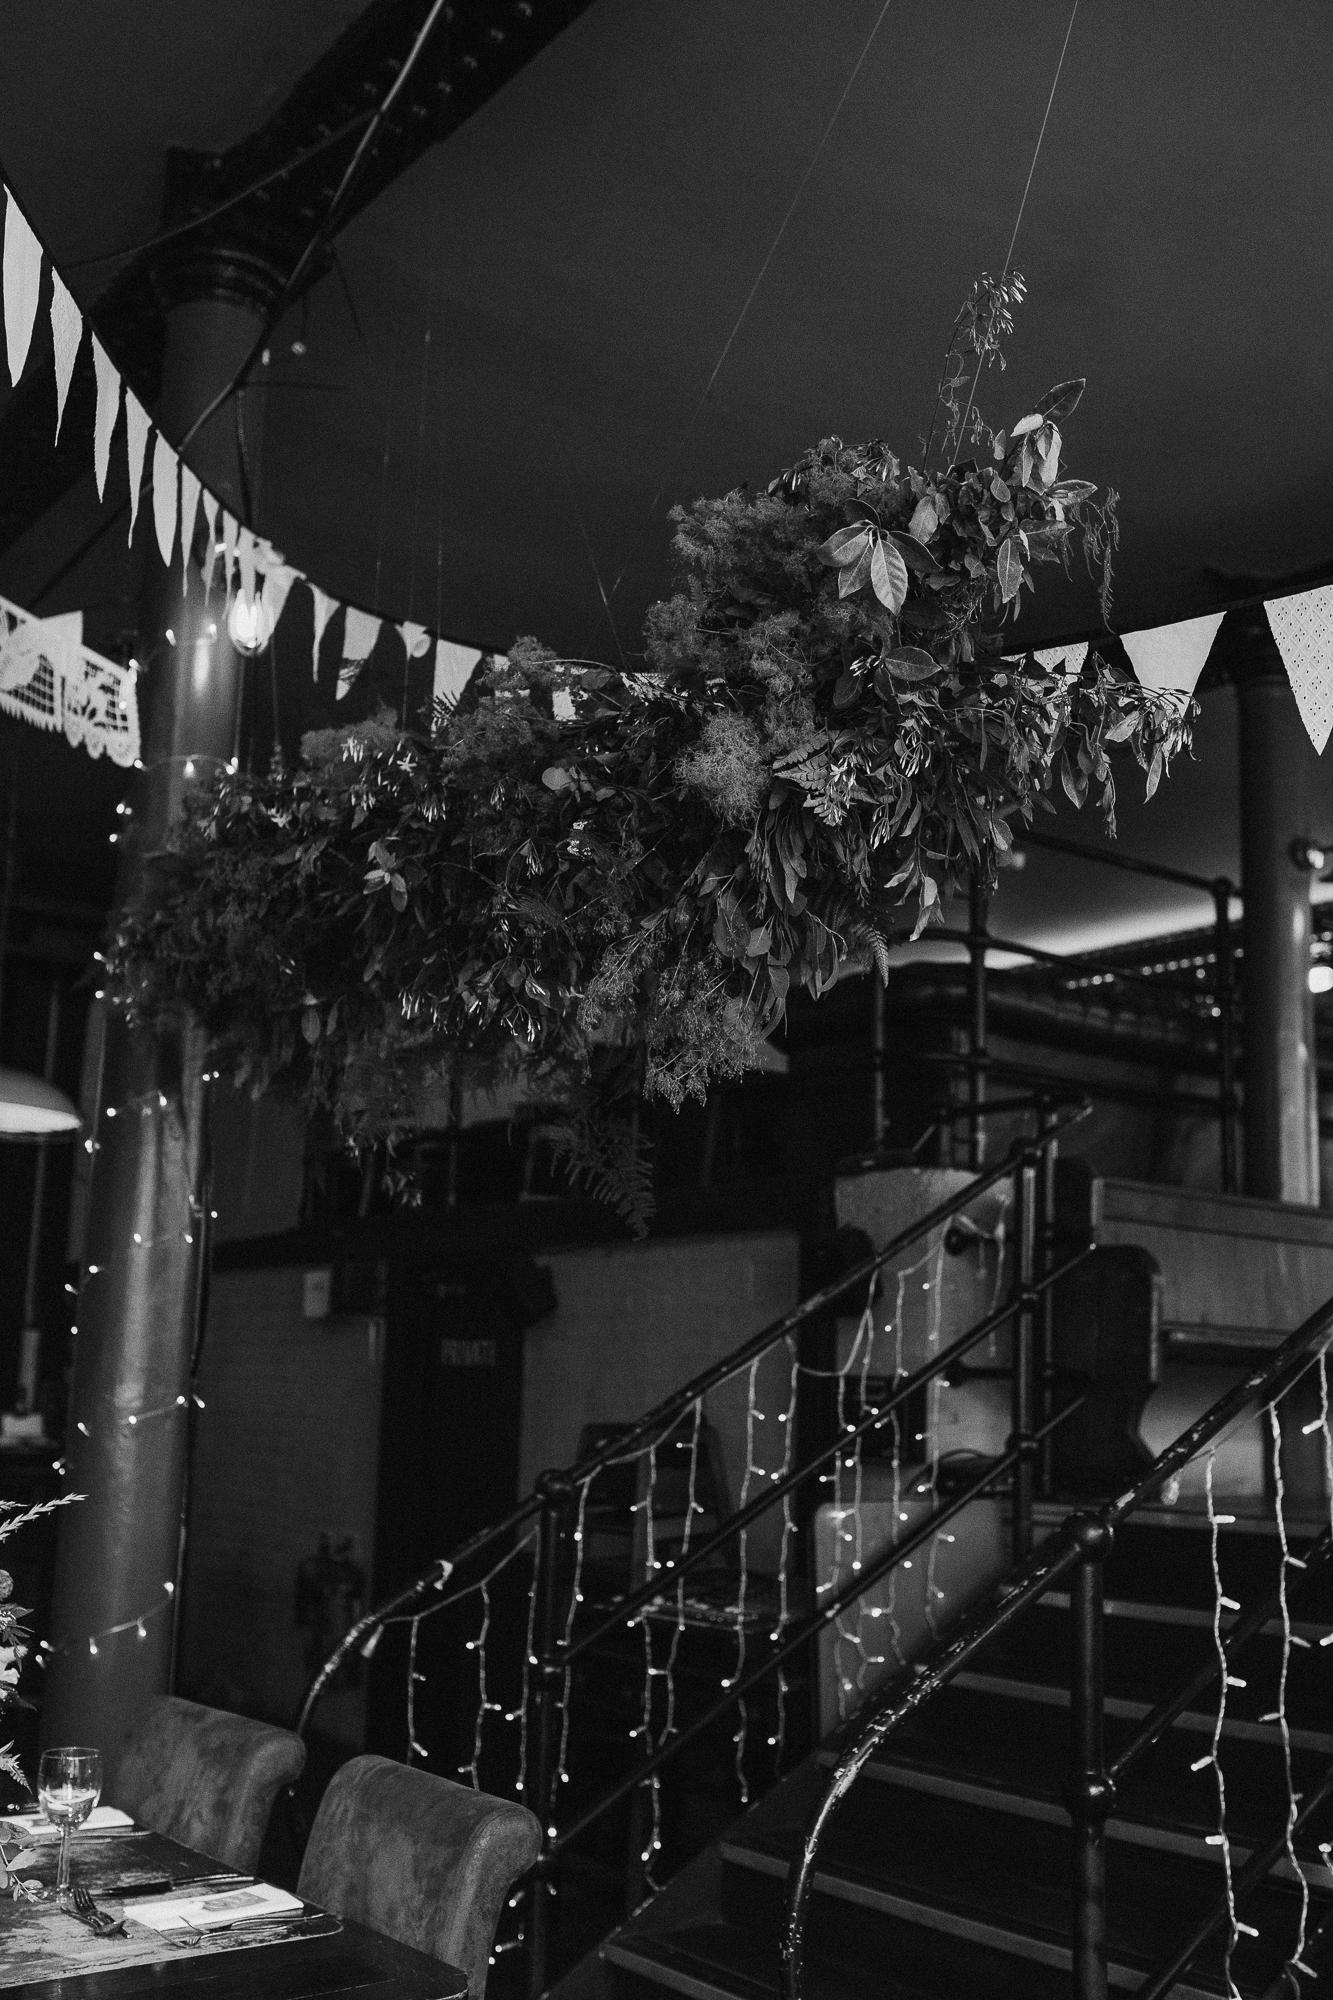 stephanie-green-wedding-photography-sulaflowers-sula-flowers-london-islington-town-hall-depot-n7-141.jpg